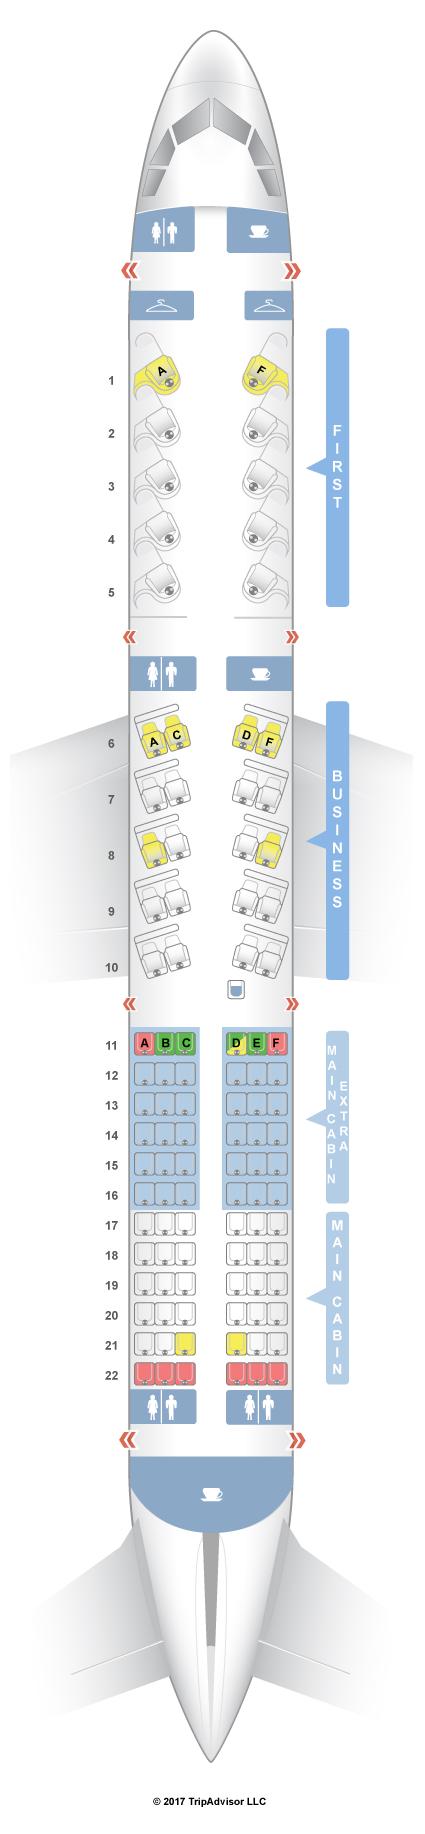 Seatguru Seat Map American Airlines Airbus A321 32b Transcon